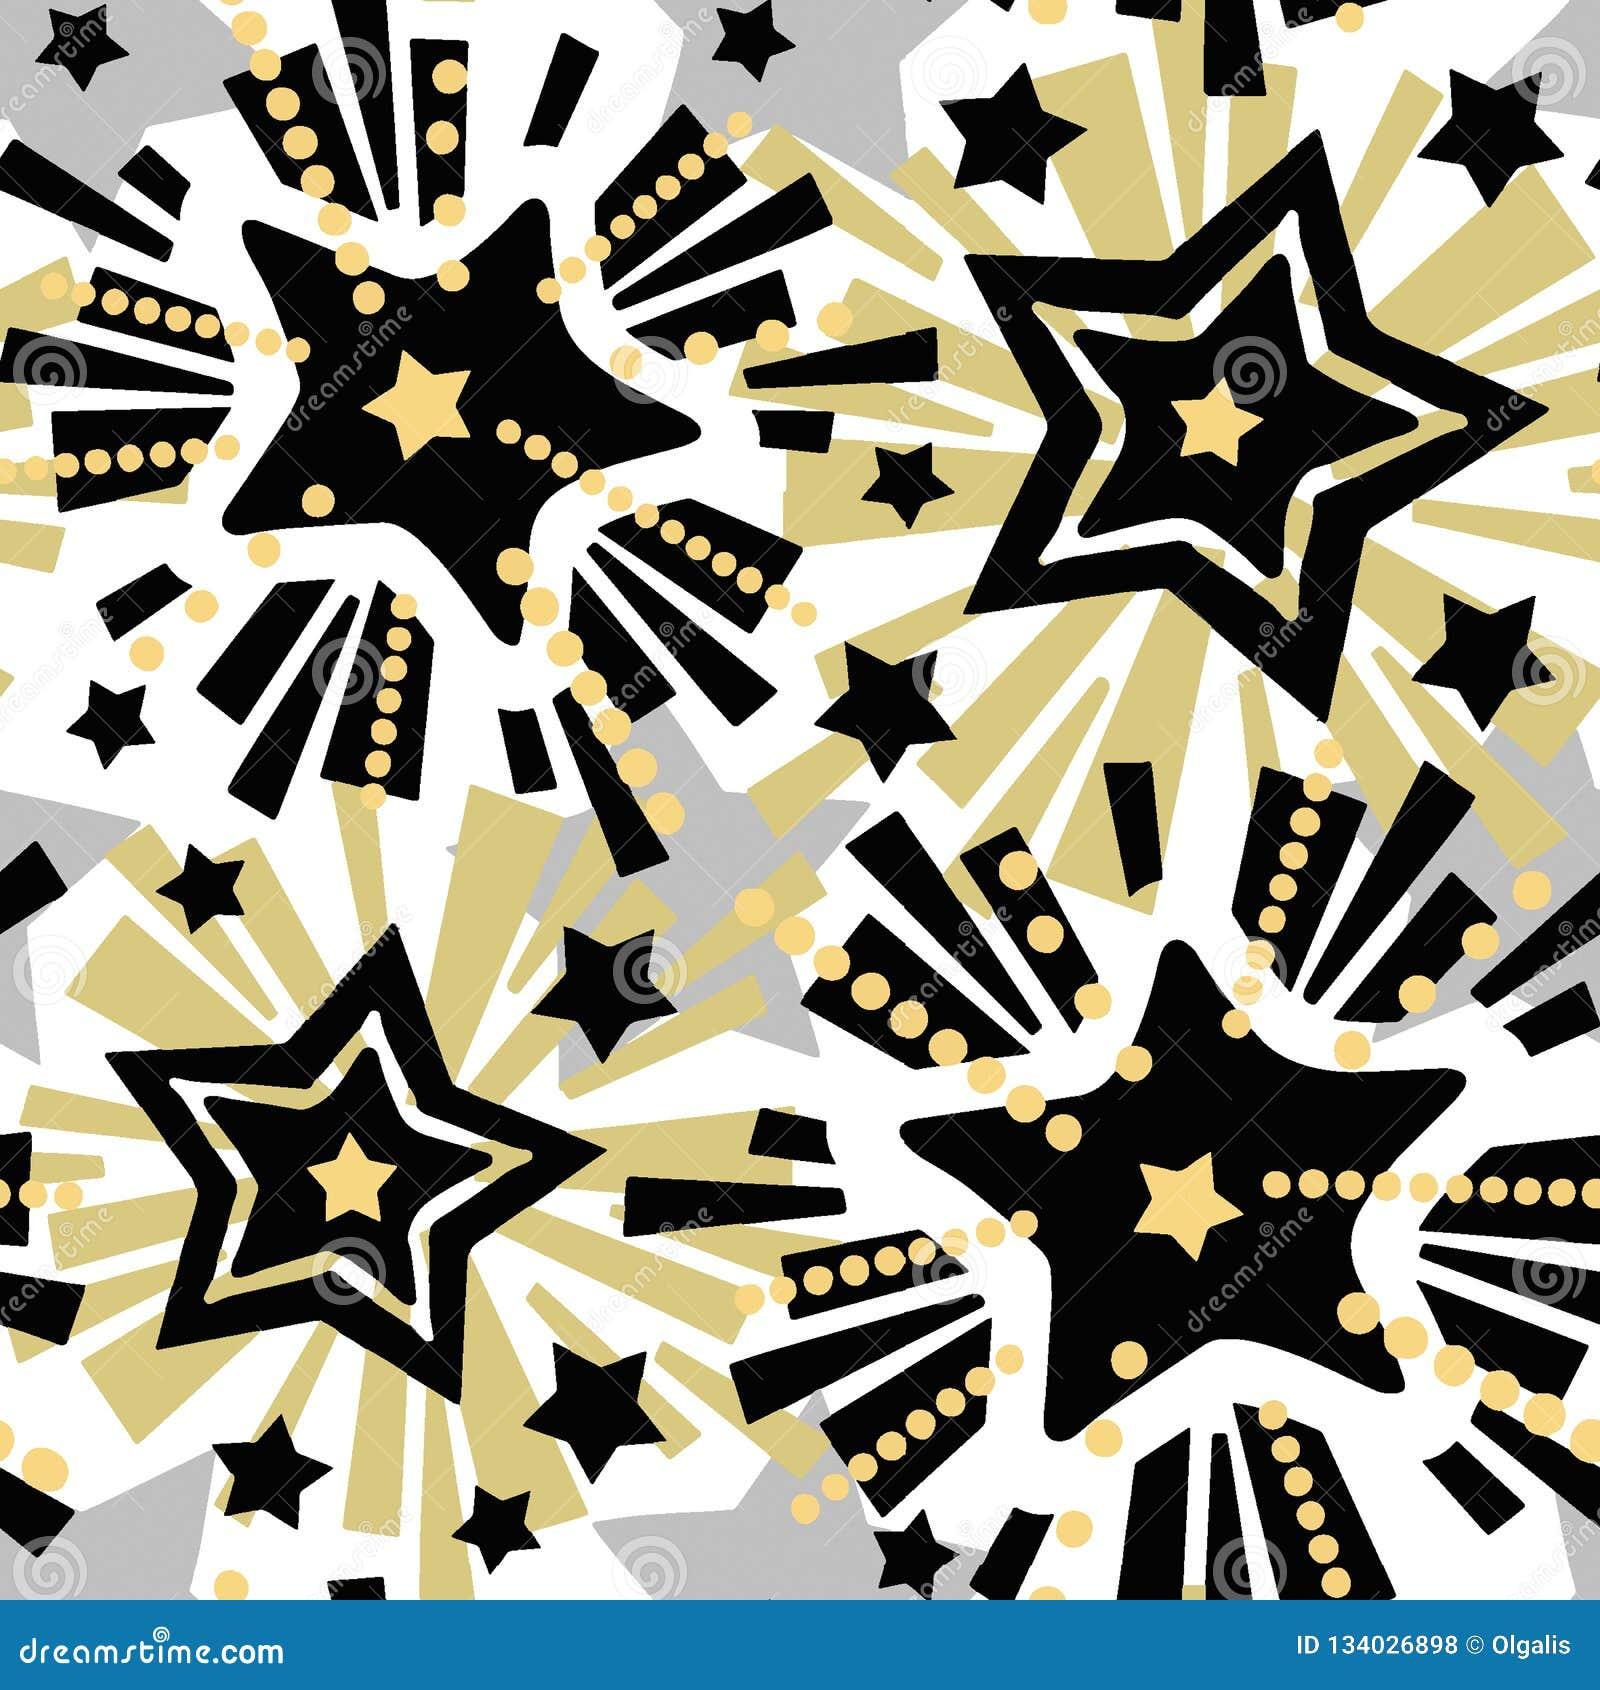 Star Festive Print Seamless Motif Christmas Hand Craft